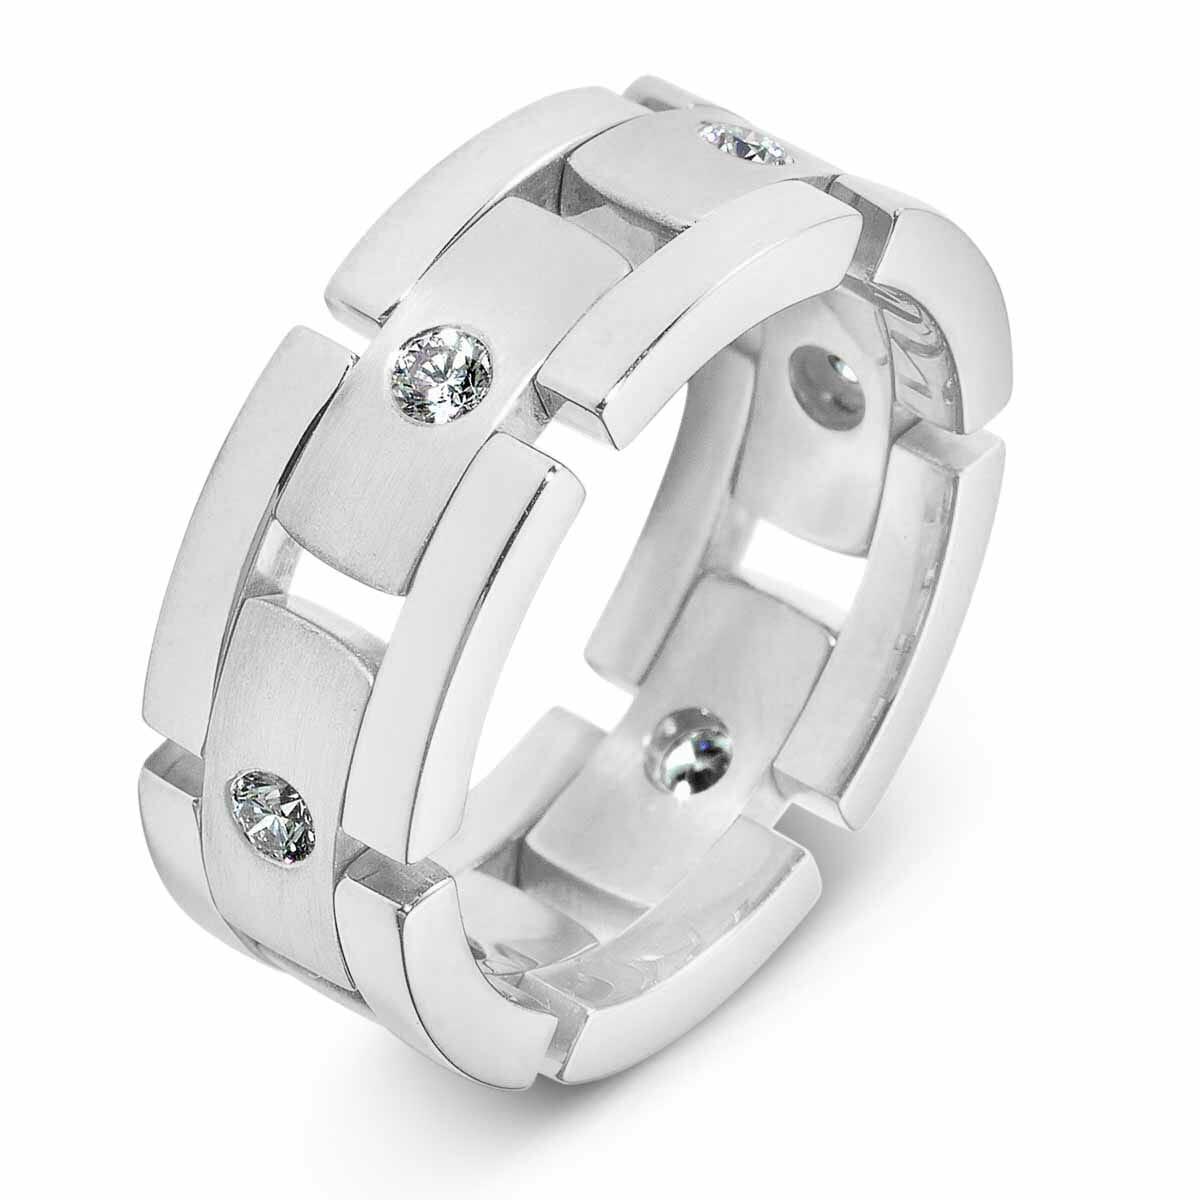 Mens Fexible Diamond Wedding Band Dora Collection The Diamond